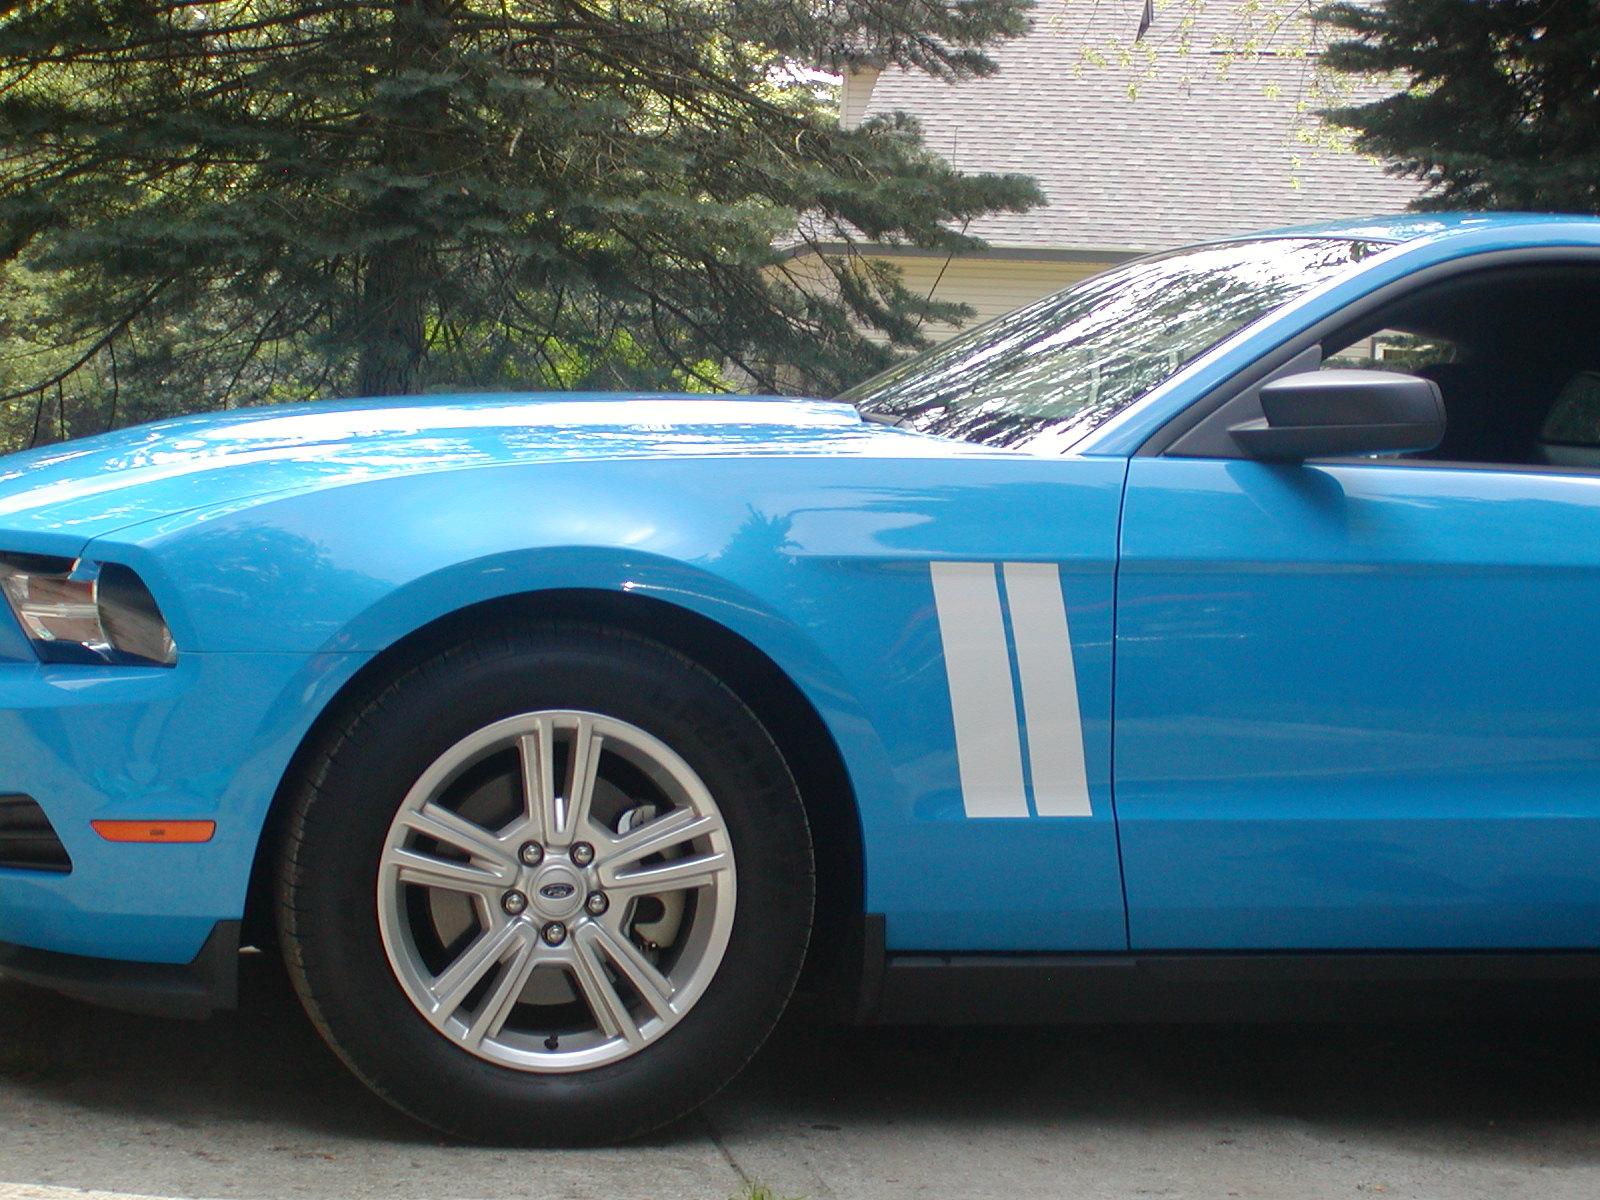 �2010 - 2011 - 2012 Mustang Short fender Hash Mark Stripes Set